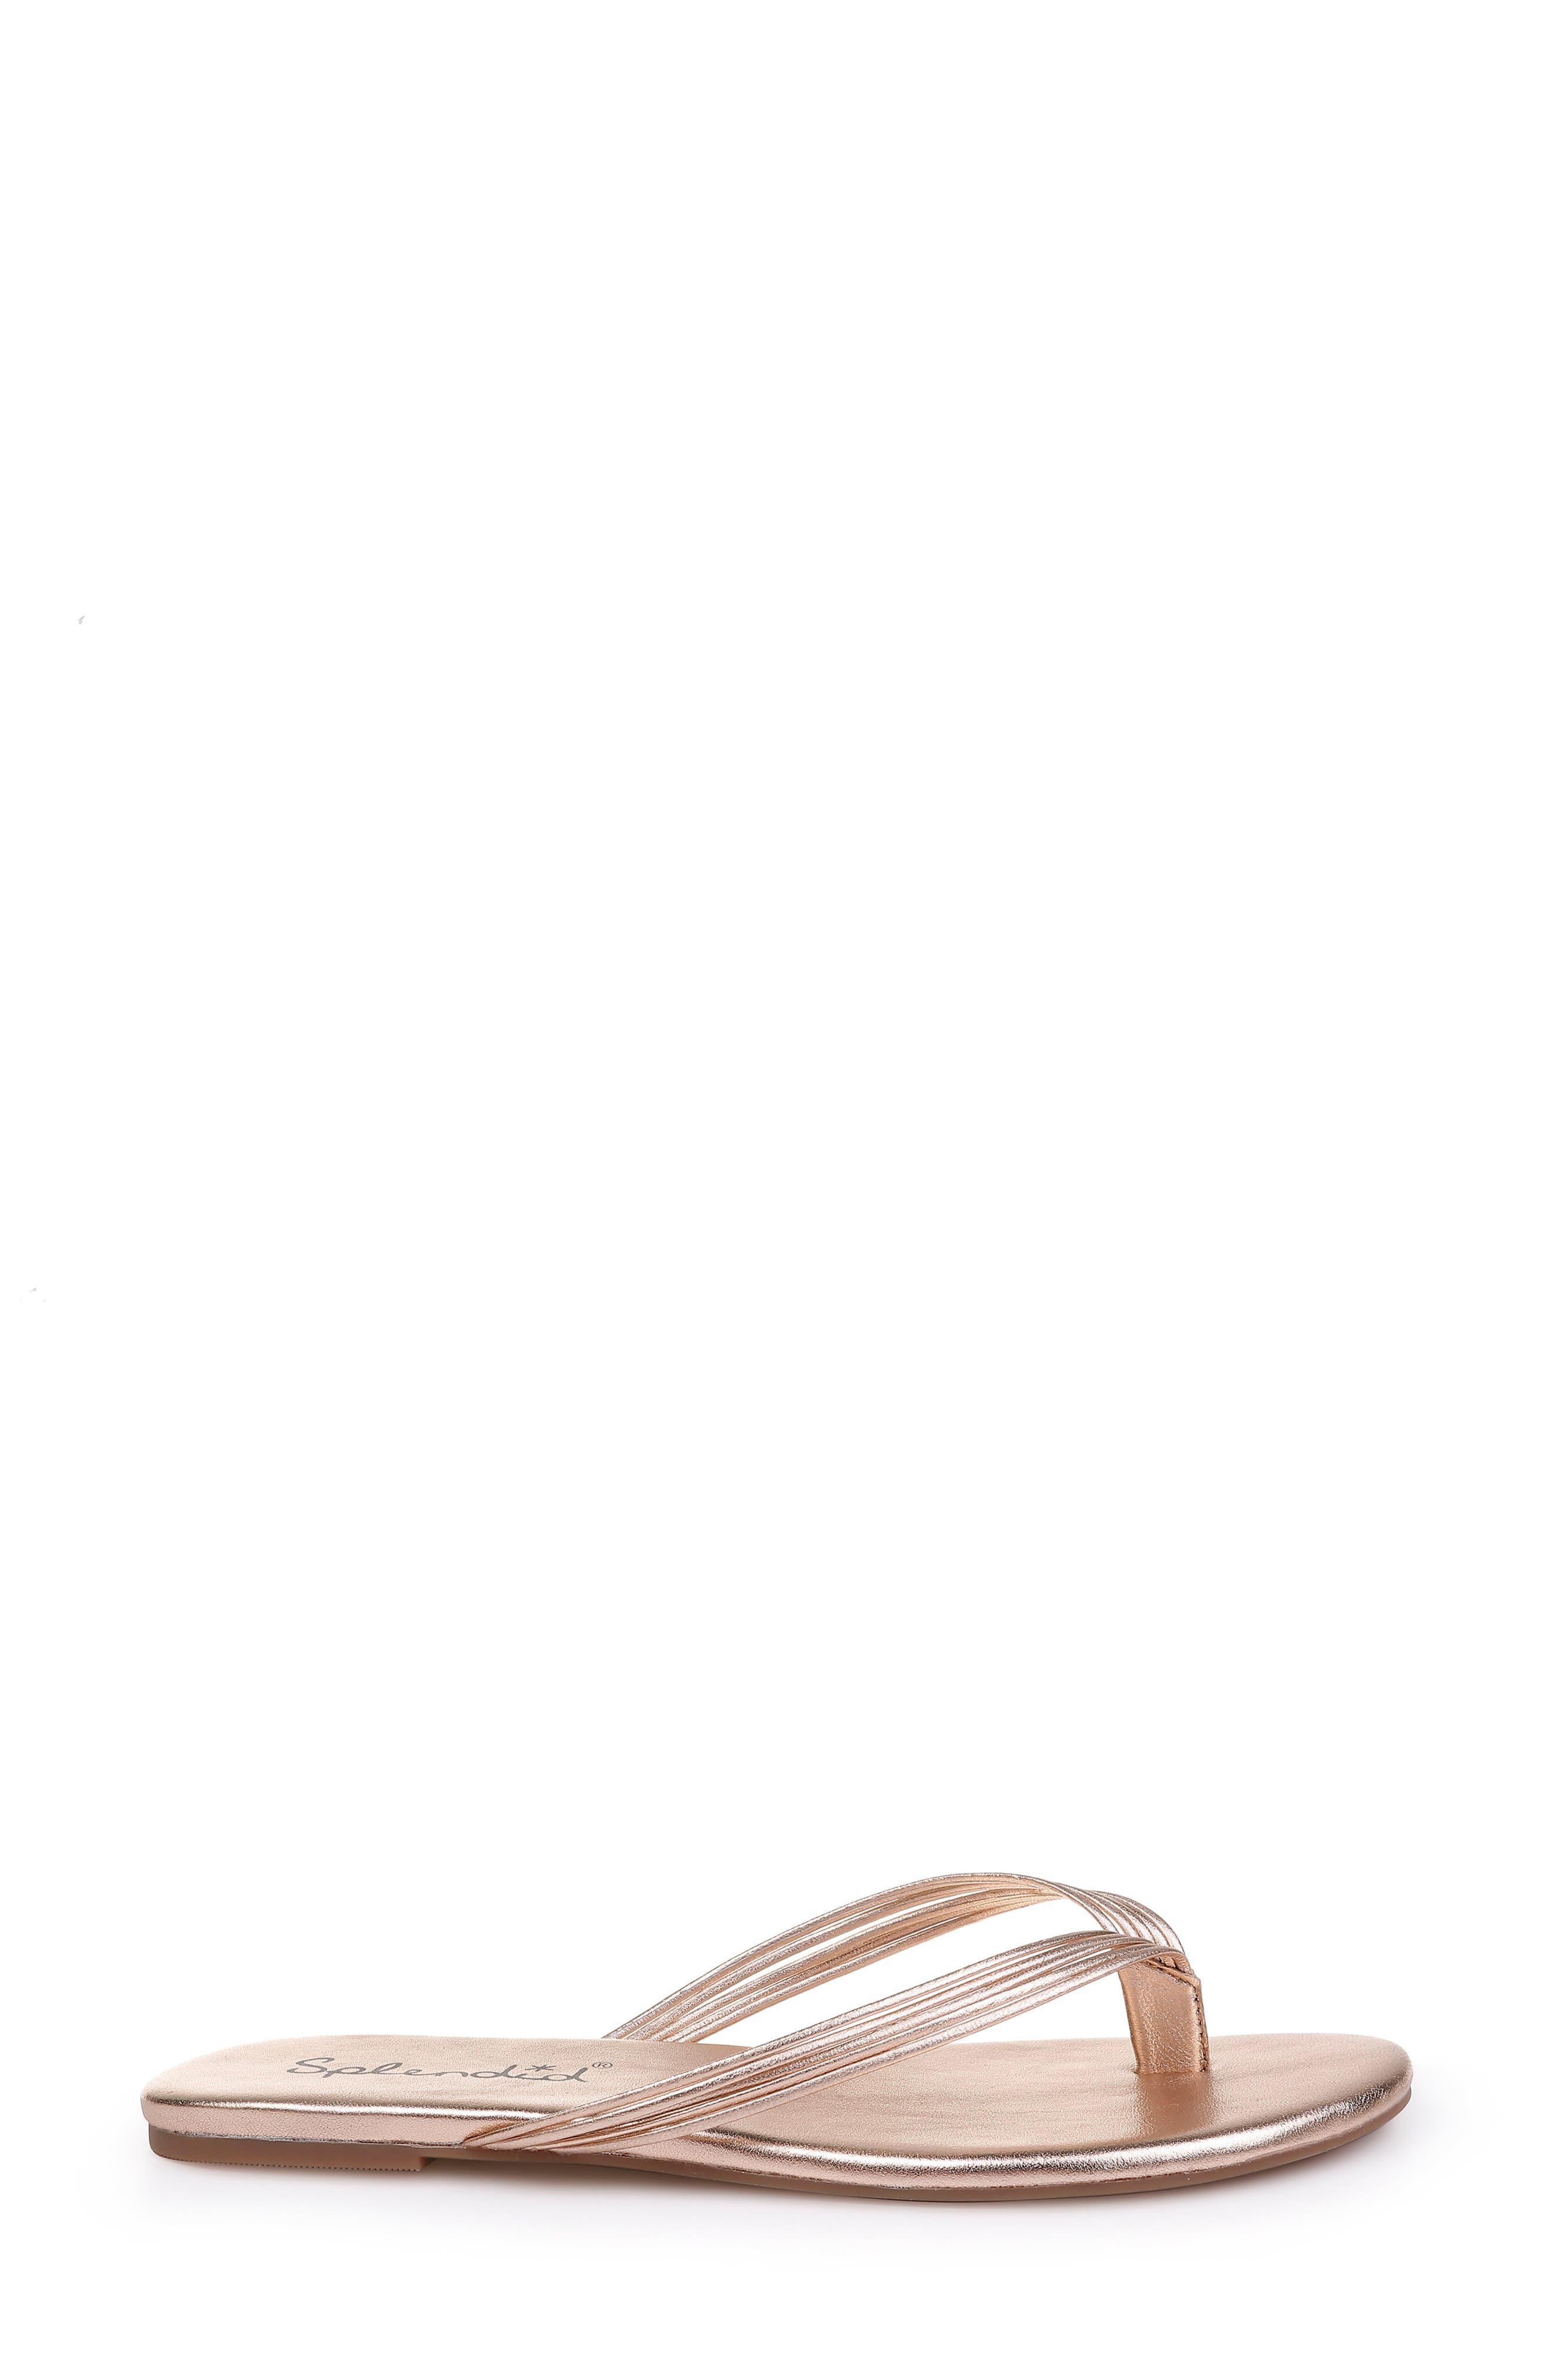 SPLENDID, Shyanna Strappy Flip Flop, Alternate thumbnail 3, color, ROSE GOLD LEATHER